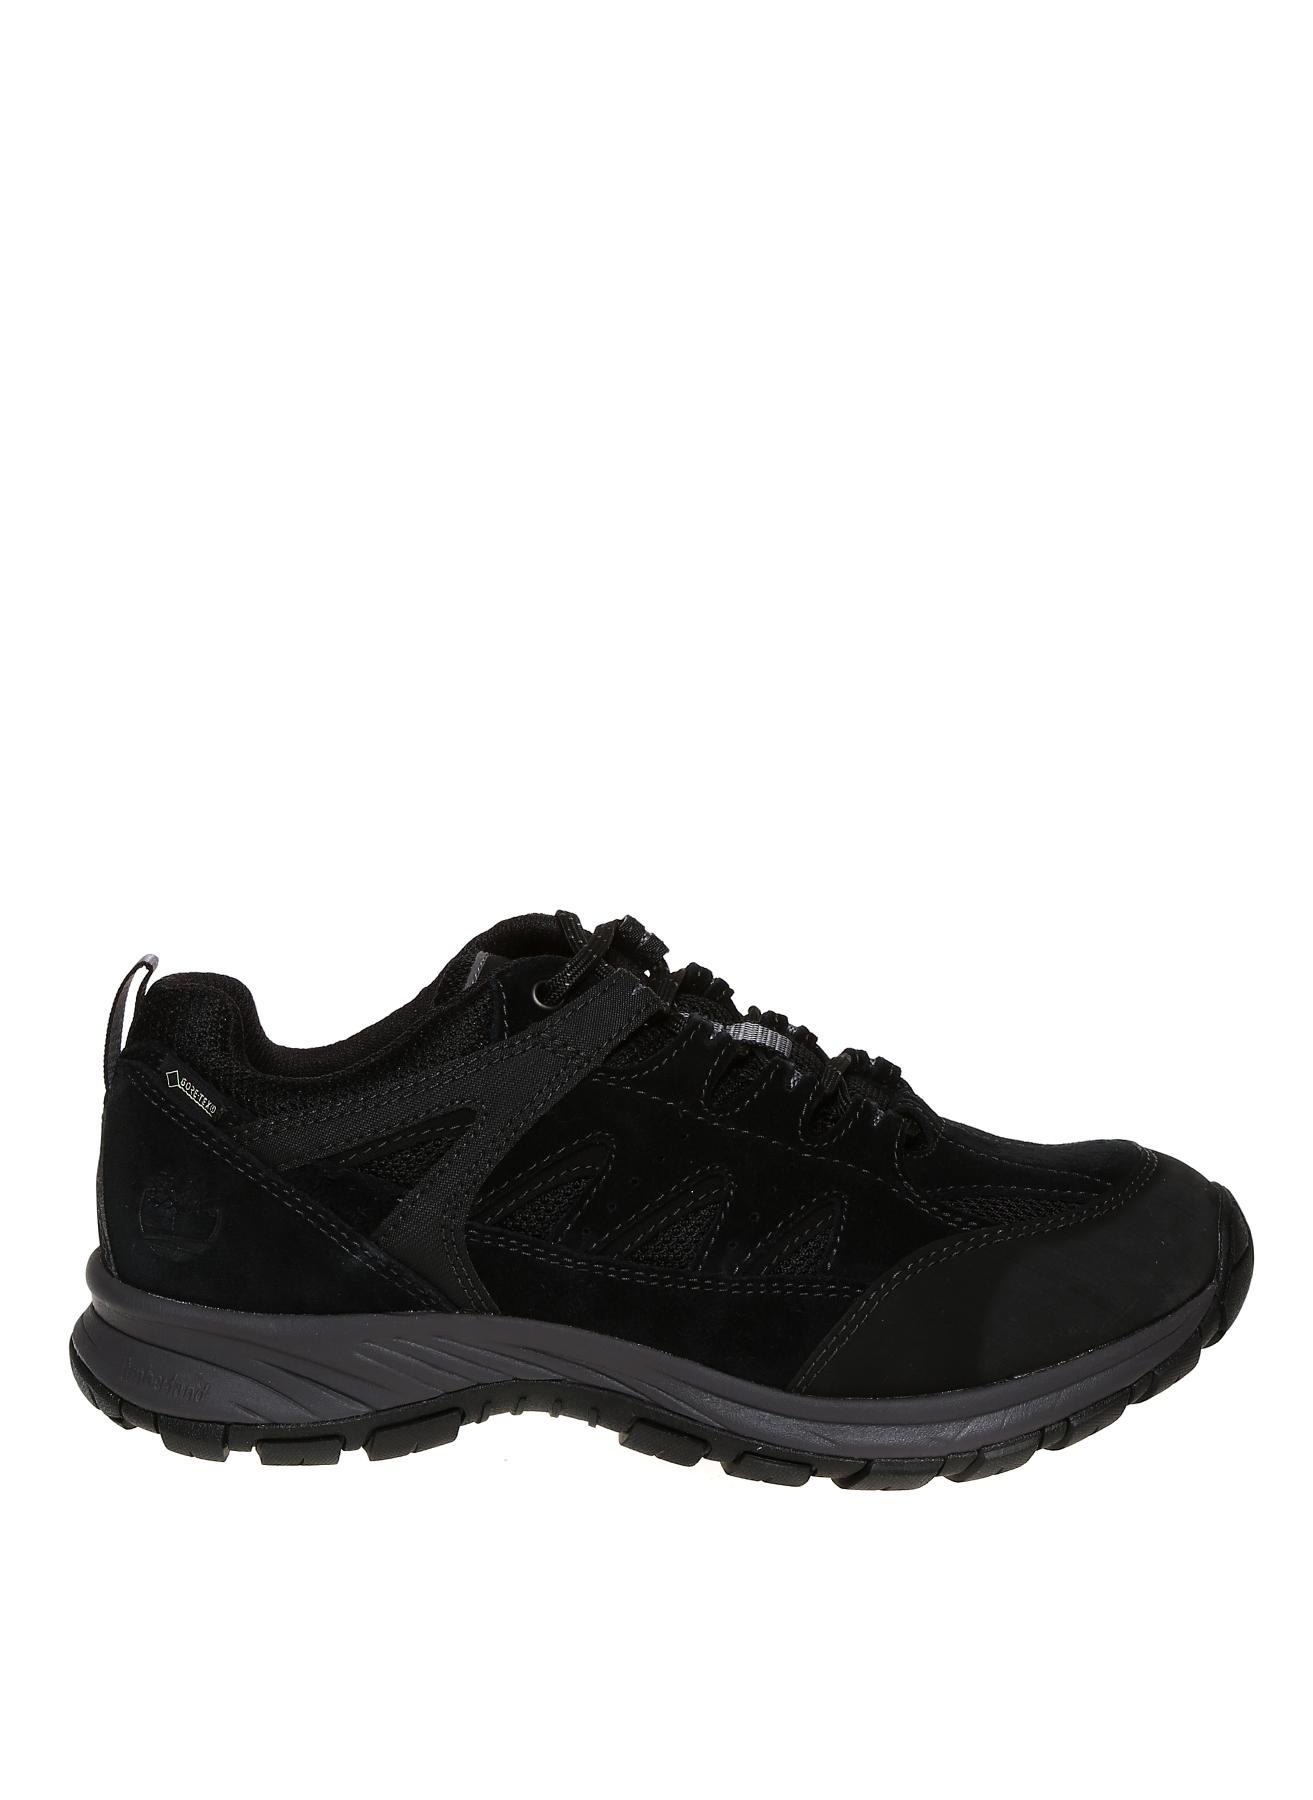 Timberland Tb0A1Pg20011 Sadler Pass F/L Low Gtx Günlük Ayakkabı 43 5002340862003 Ürün Resmi